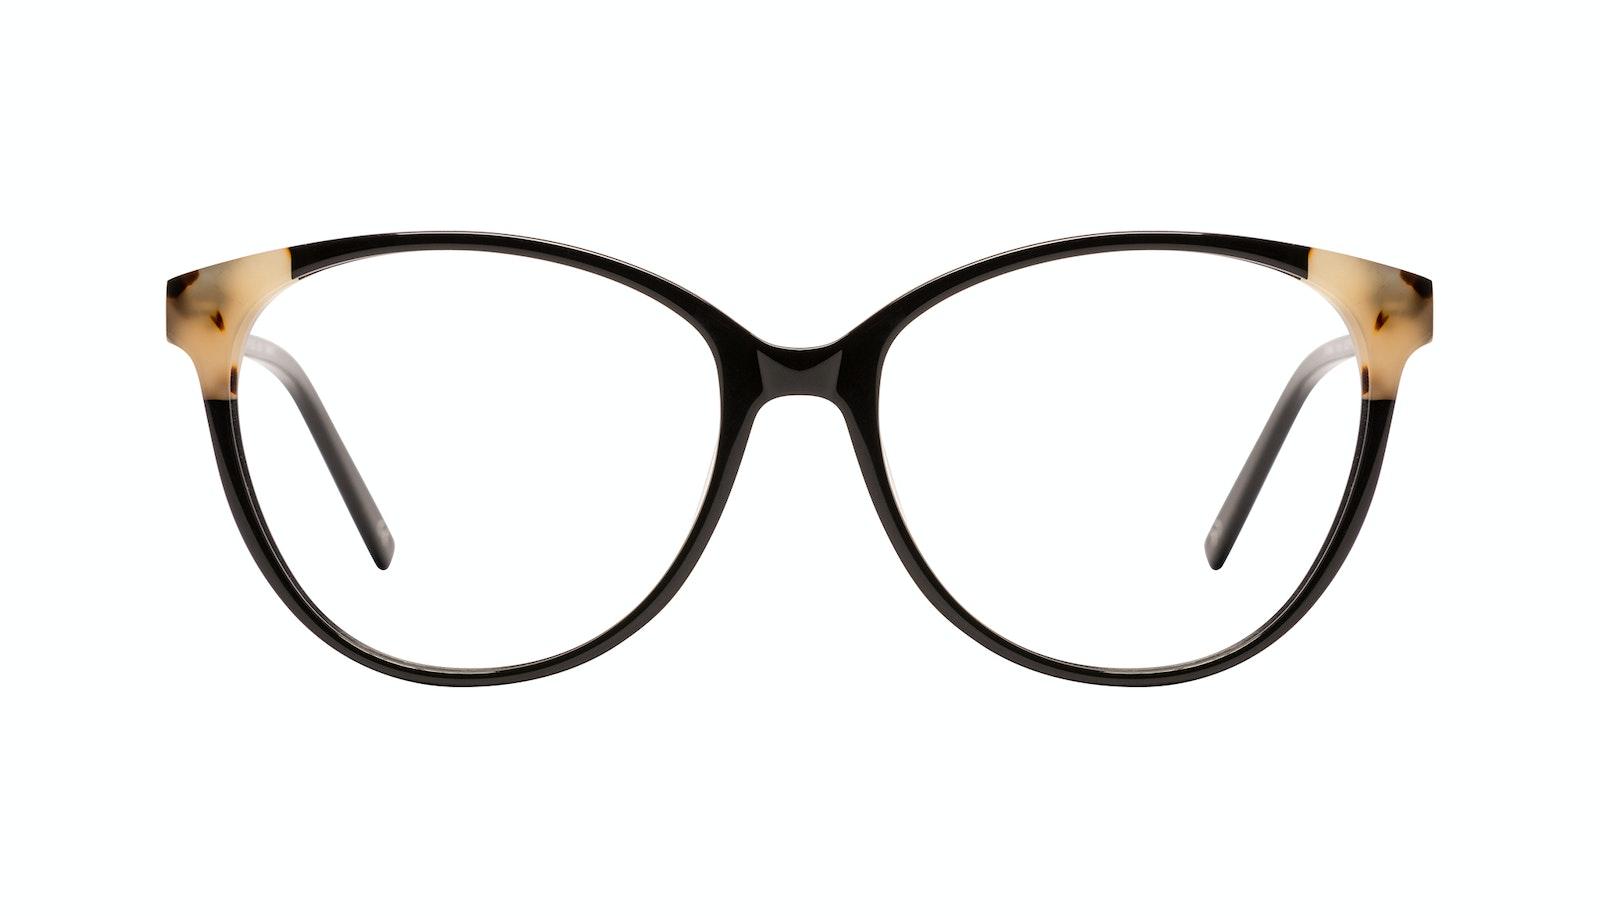 Affordable Fashion Glasses Round Eyeglasses Women Imagine II Plus Ebony Granite